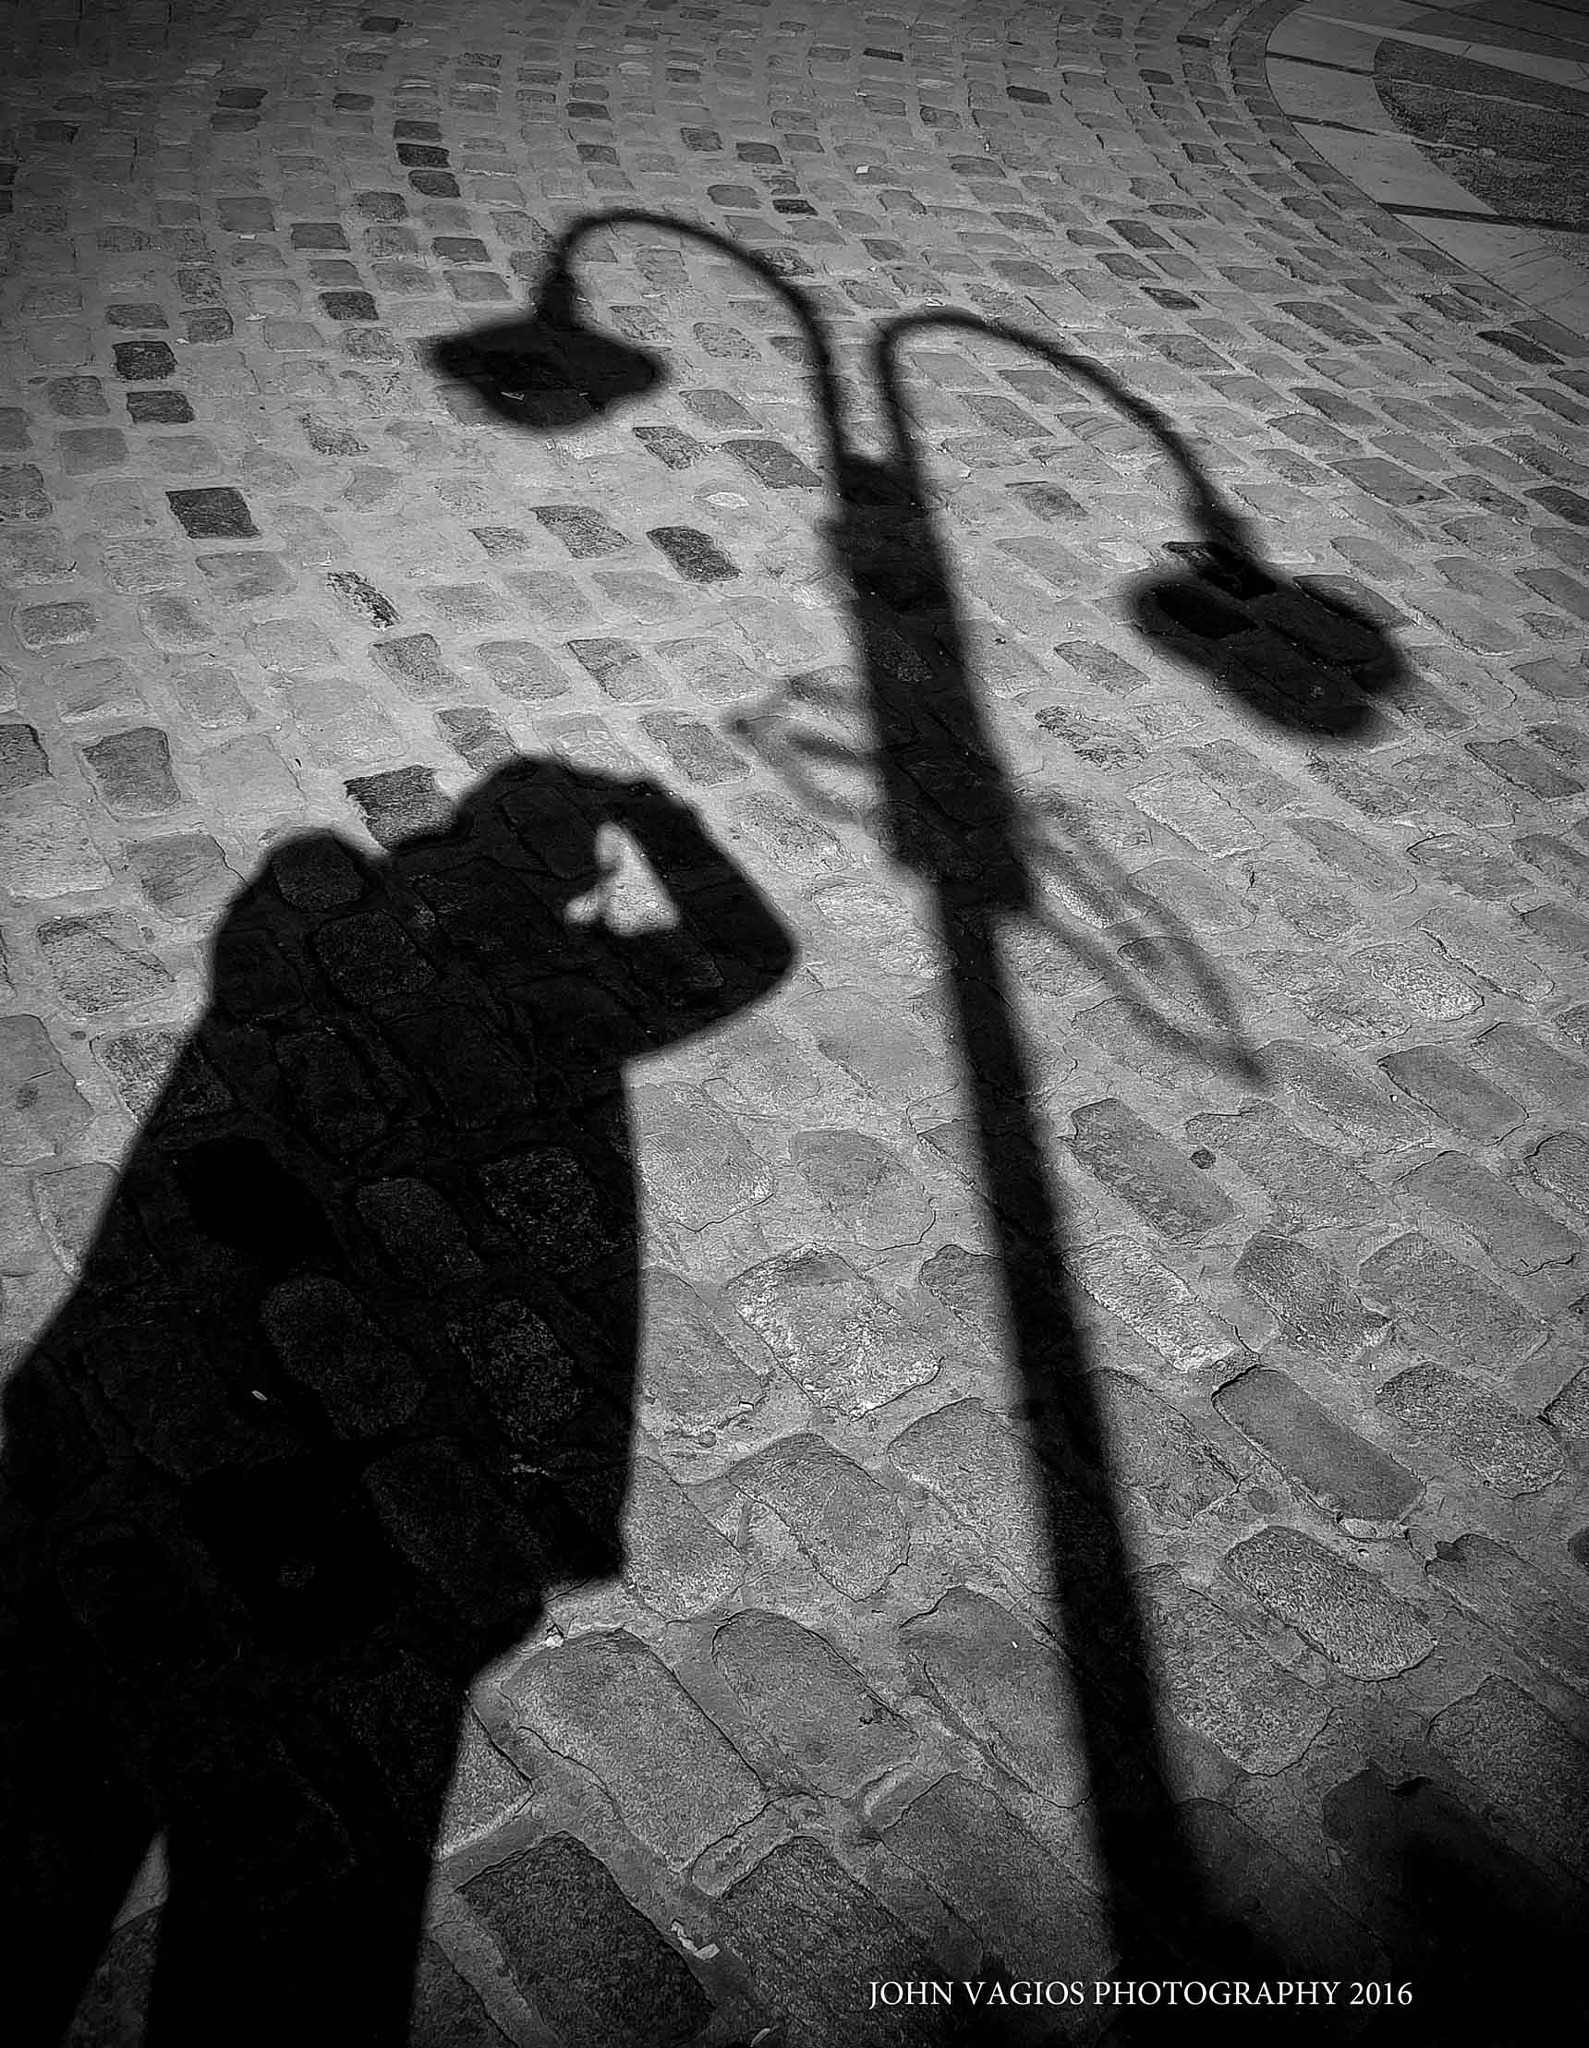 Shadows by JohnVagios